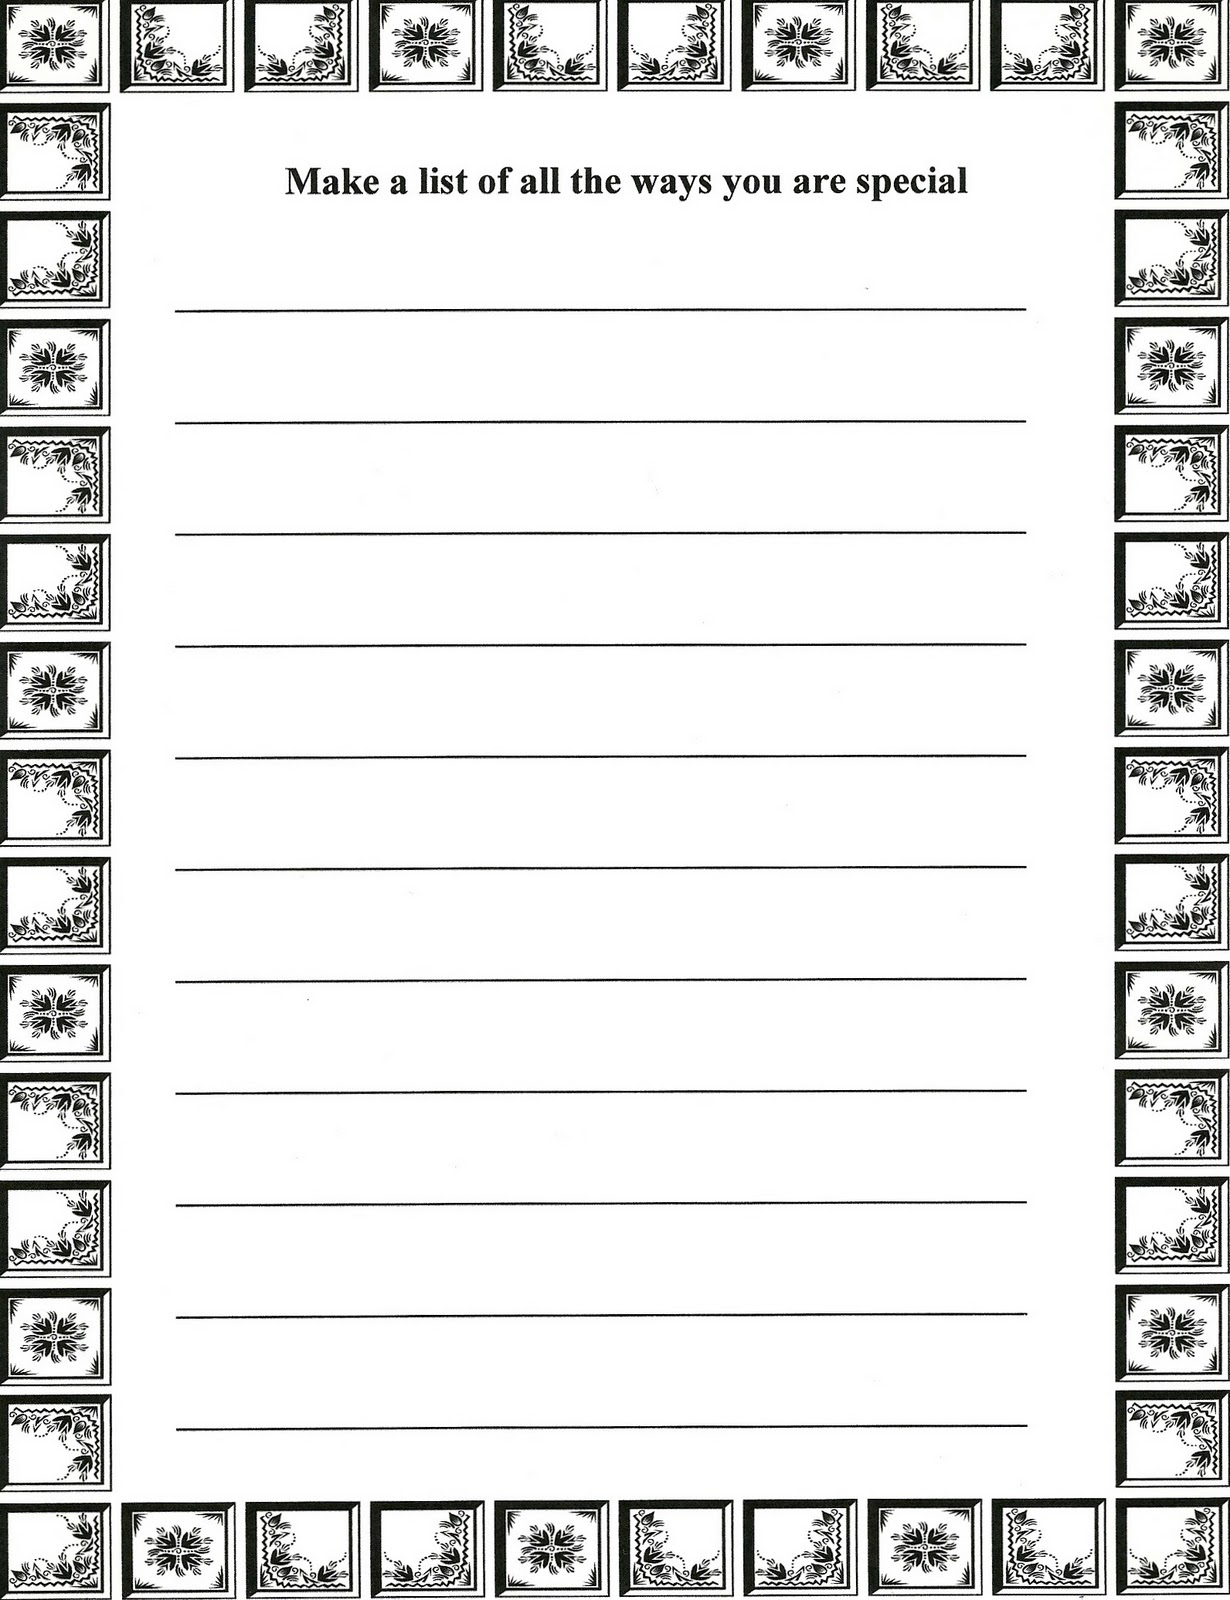 Bullying Worksheets For Preschoolers